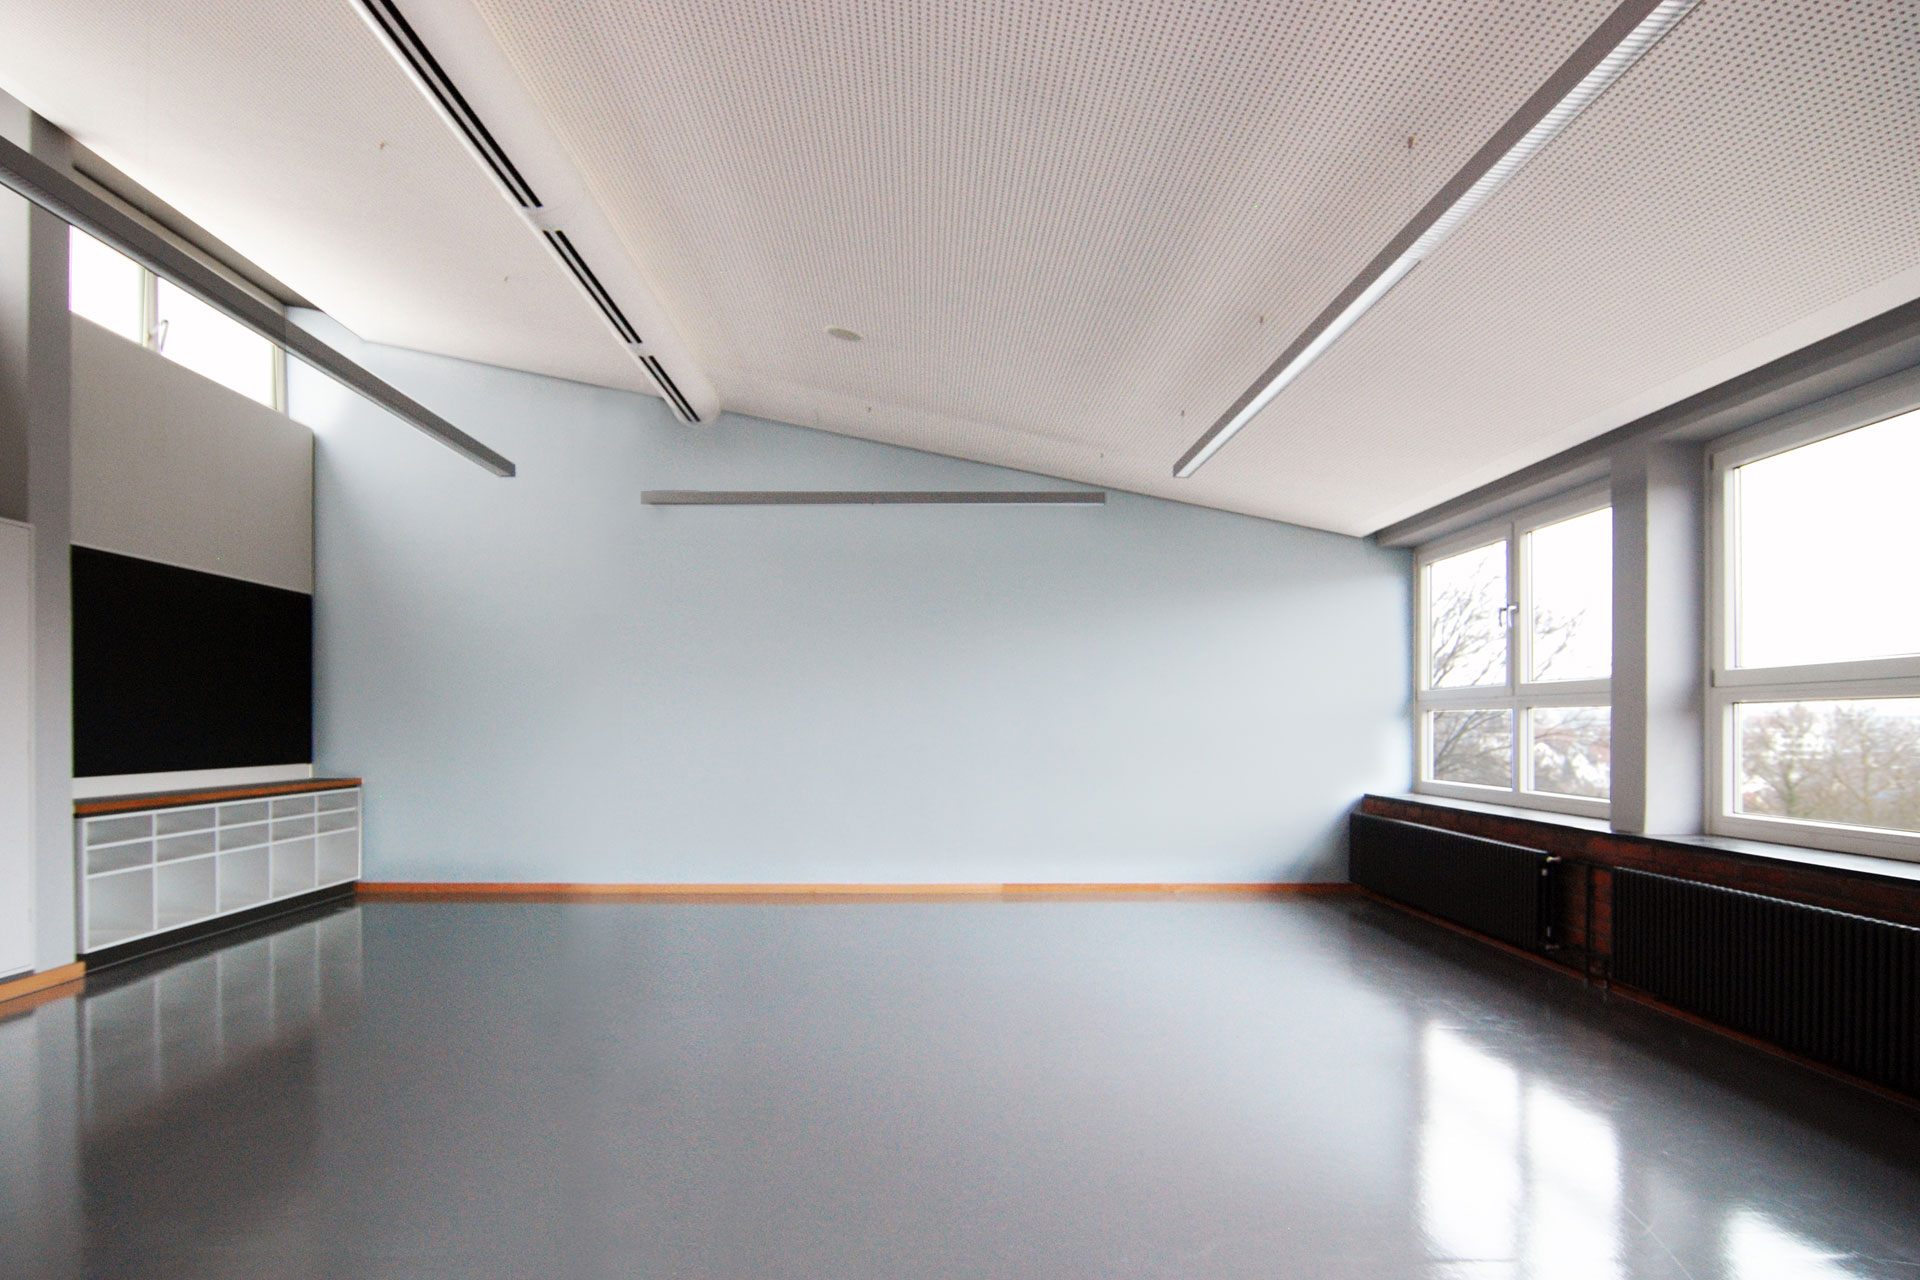 Klassenraum der Haldenrainschule